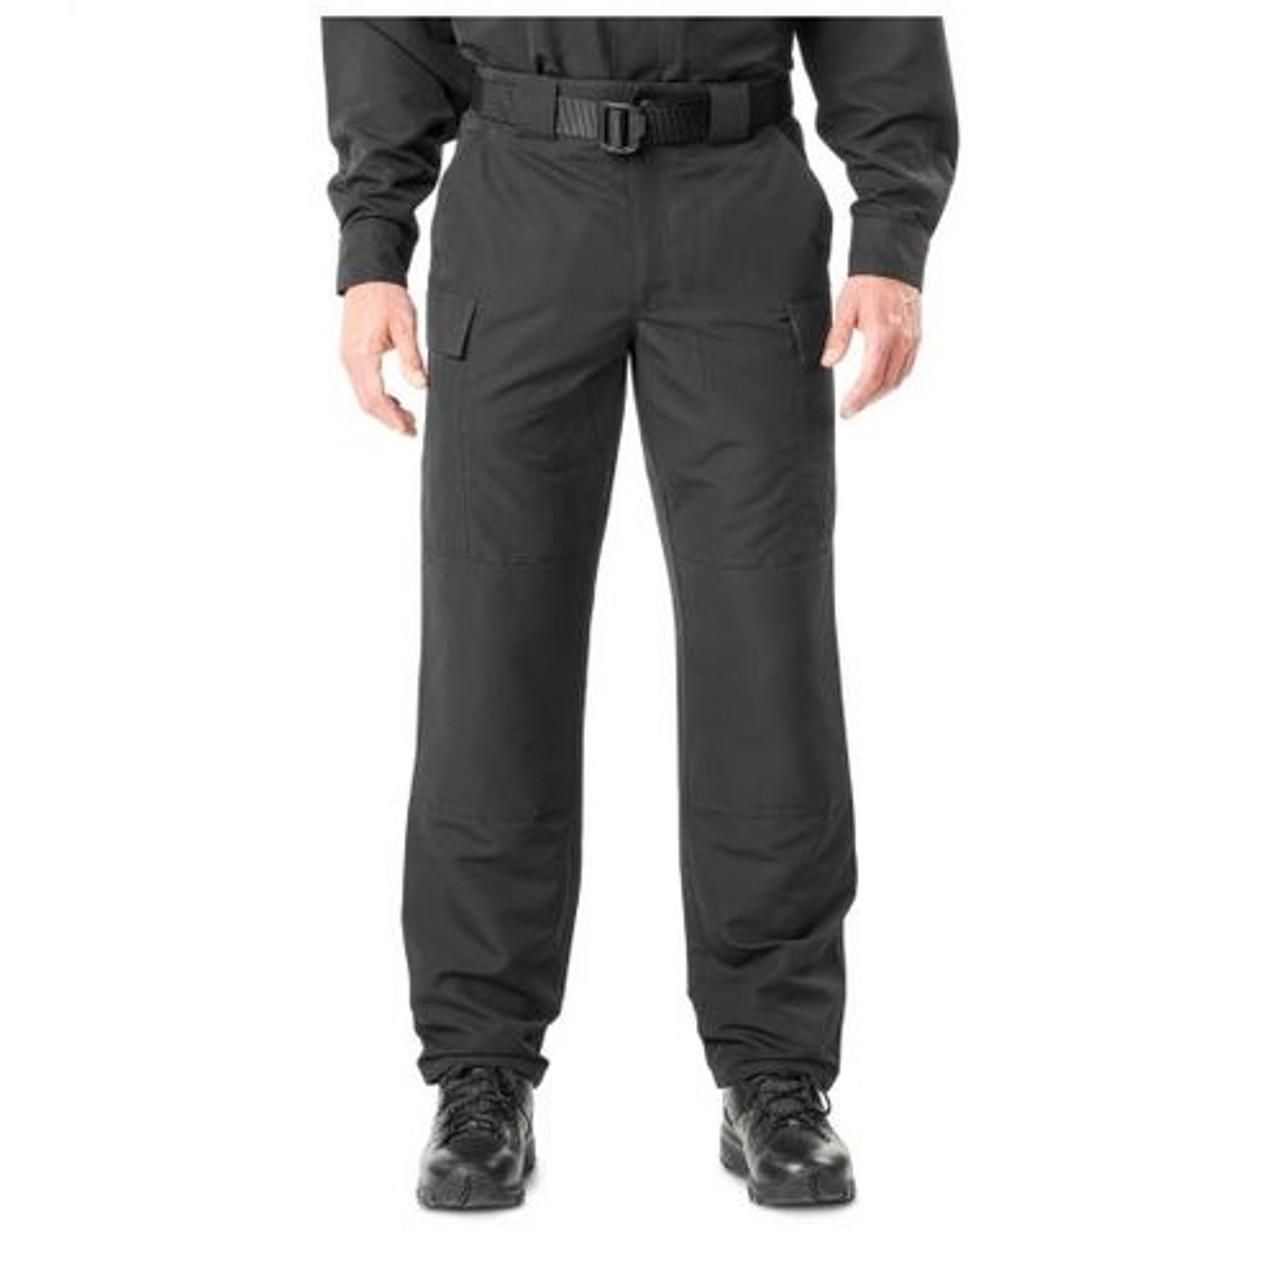 5.11 Tactical 74462 Fast-Tac TDU Tactical Uniform Pants, Classic/Straight Fit, Knee Pad Pocket, Drawstring Leg Ties, Polyester Material, Available in Black, TDU Khaki, TDU Green, or Dark Navy